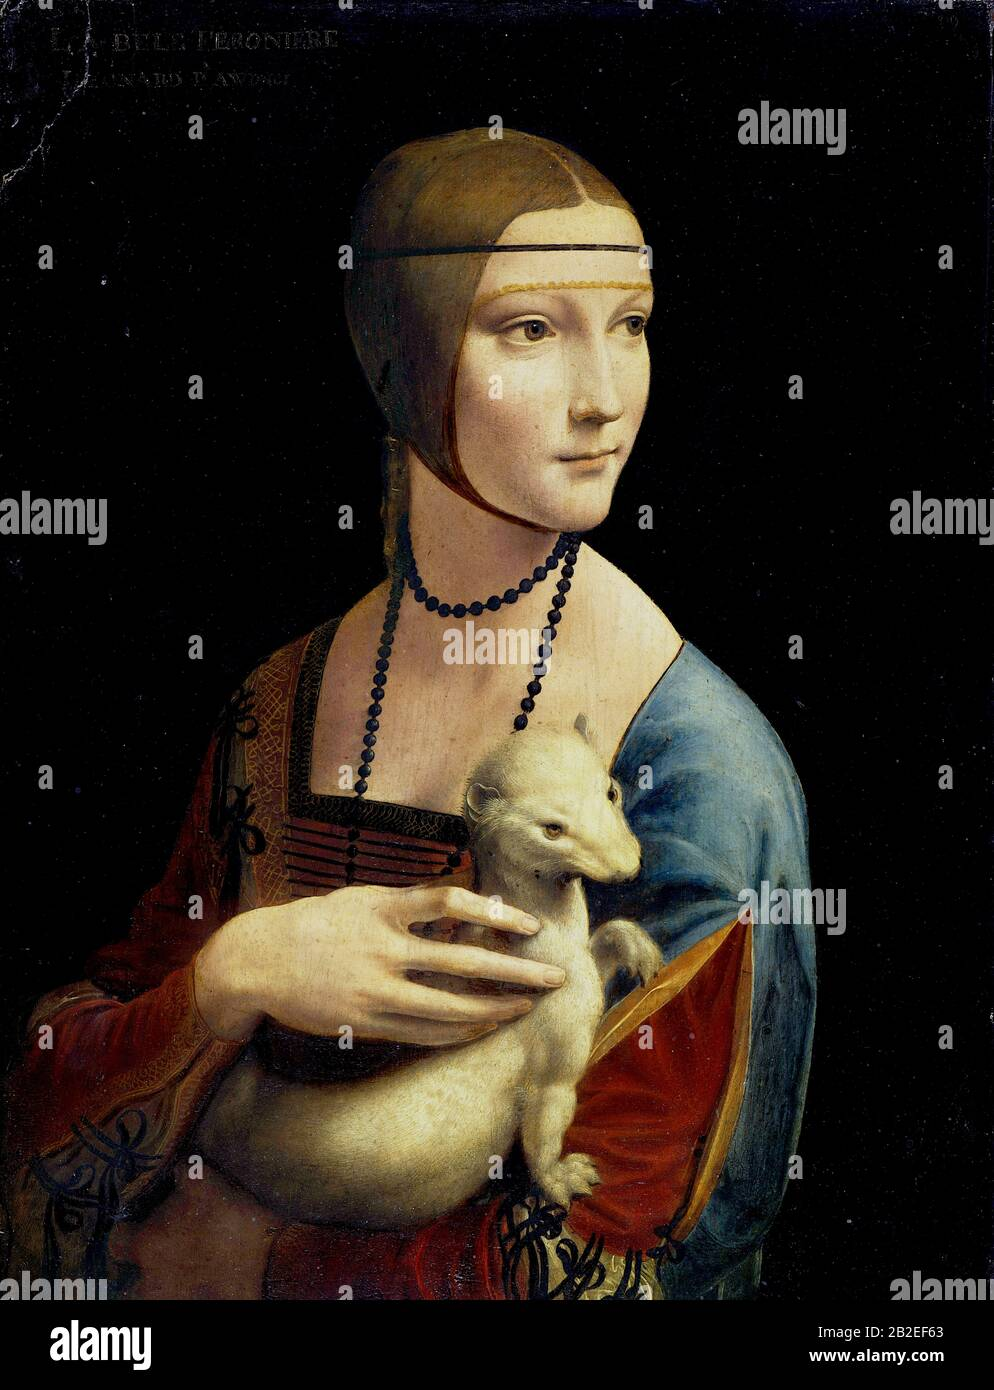 The Lady with an Ermine (Portrait of Cecilia Gallerani) (circa 1490) by Leonardo da Vinci - Very high quality and resolution image Stock Photo